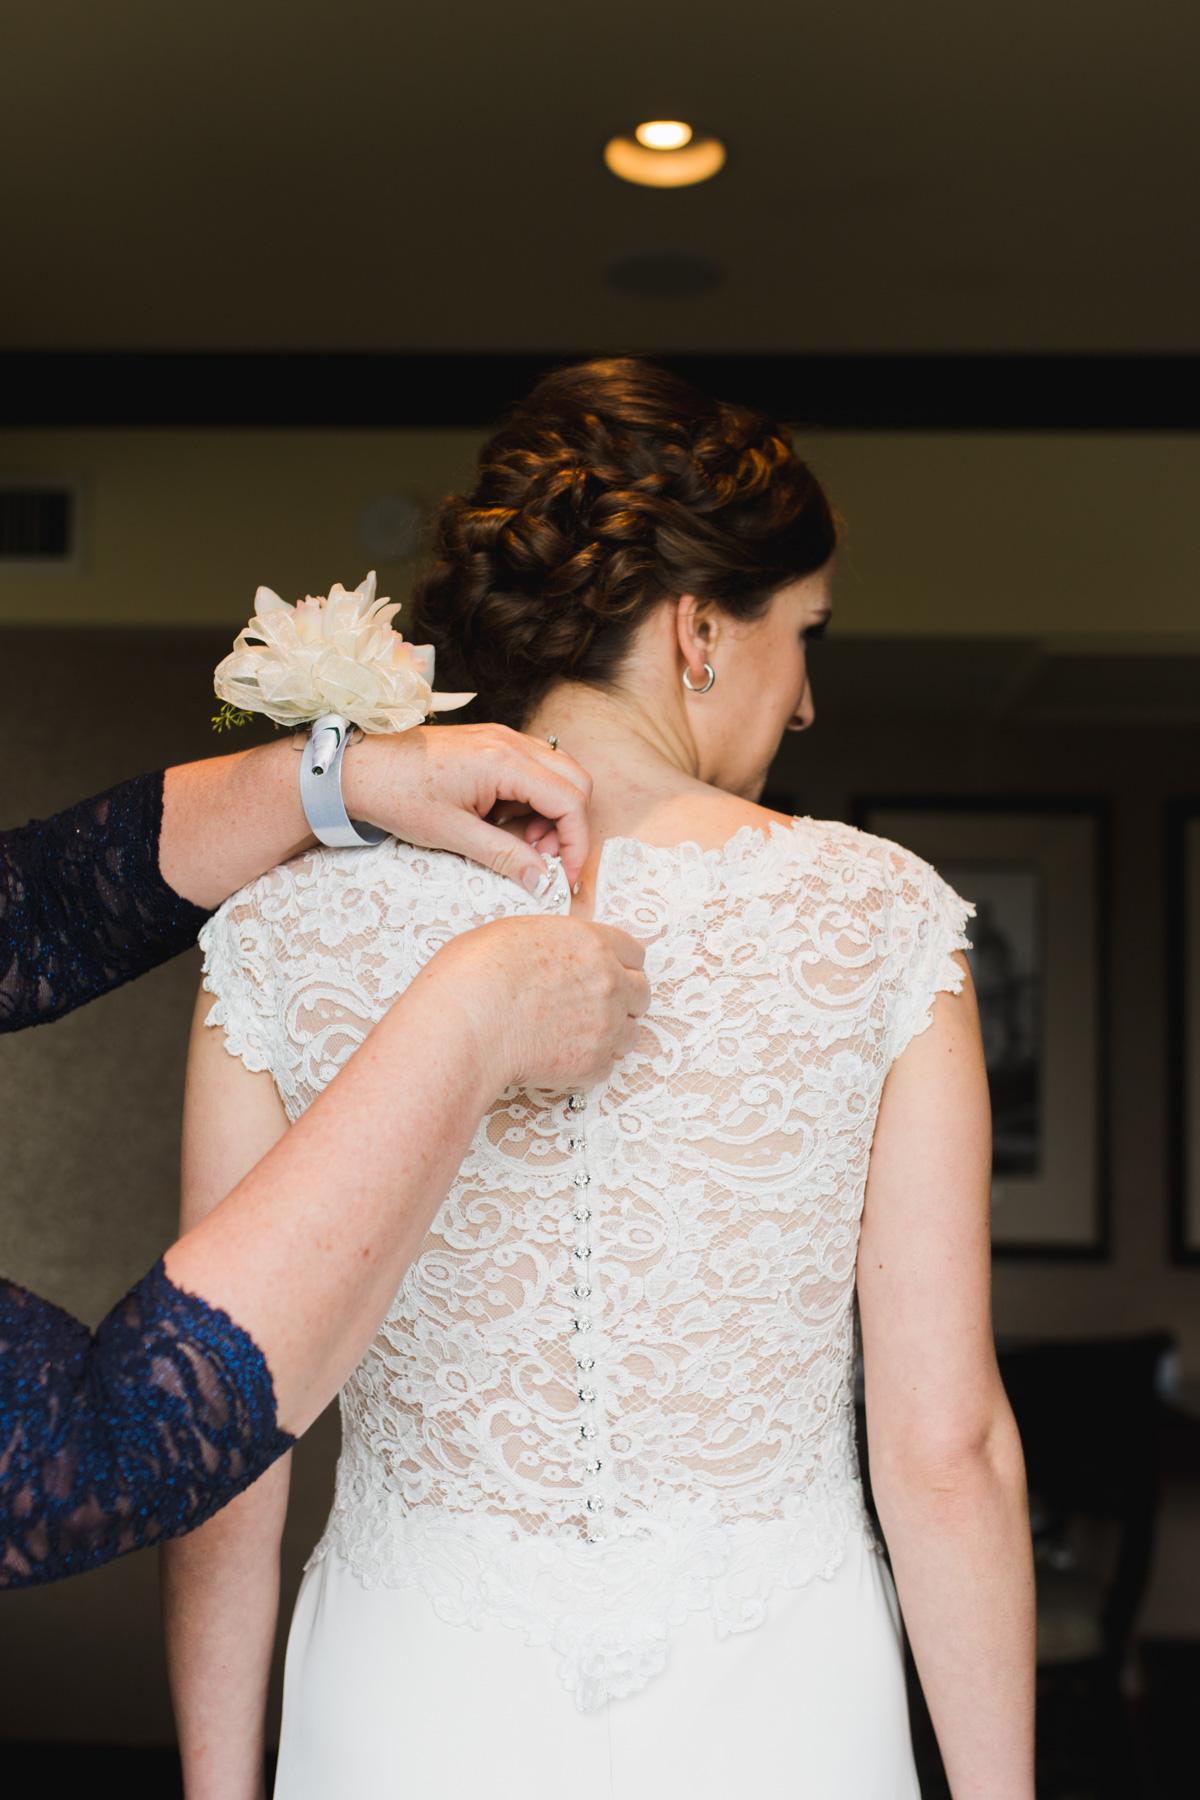 white wedding dress being zipped